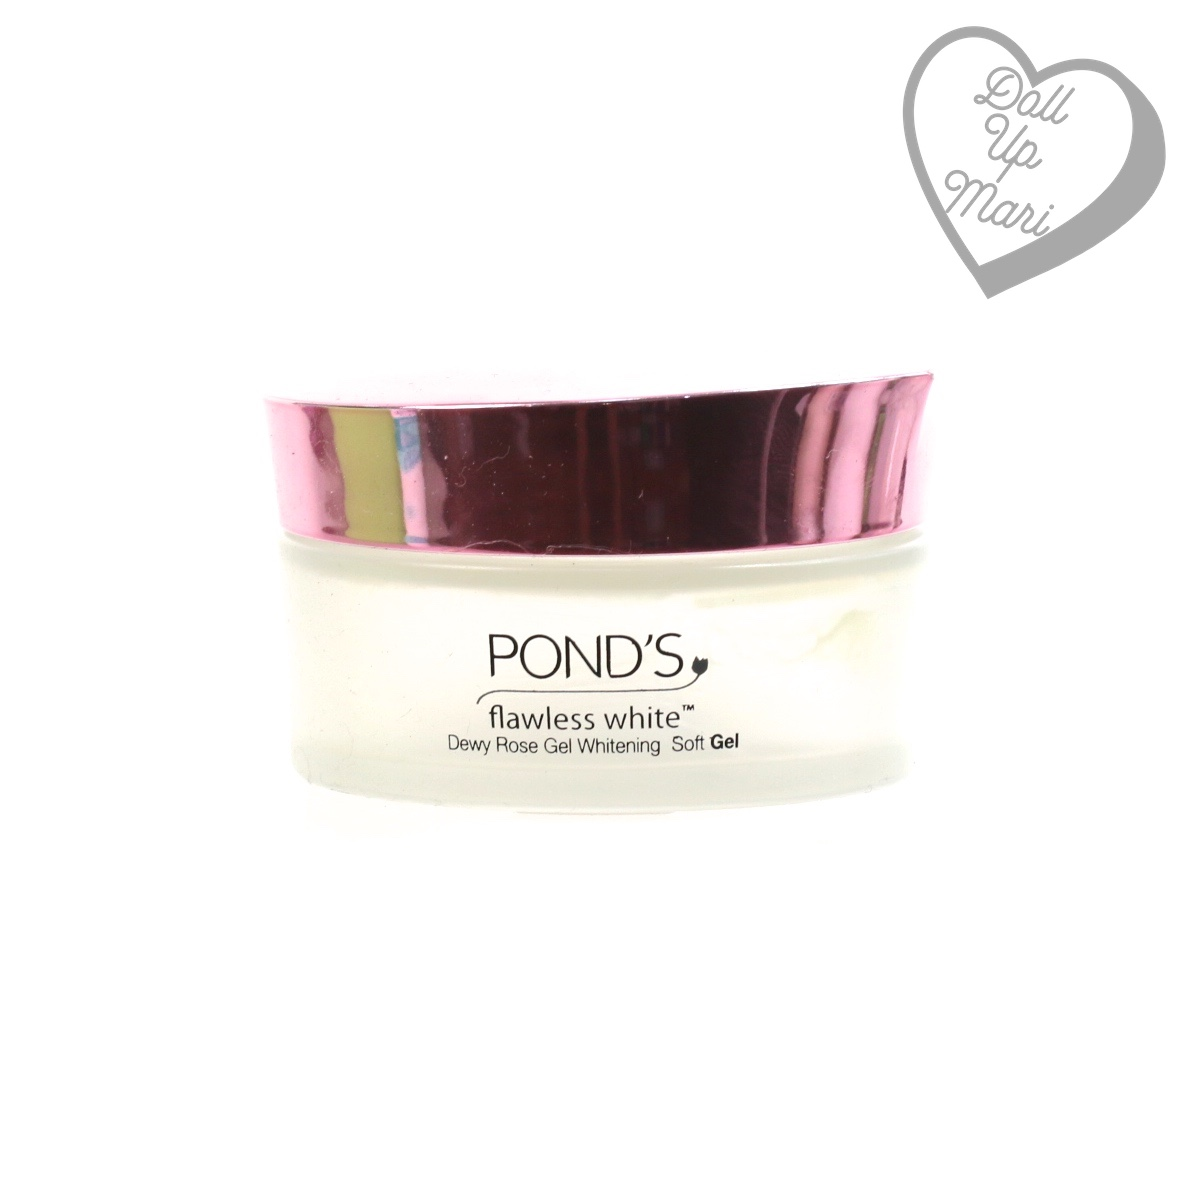 Pond's Flawless White Dewy Rose Gel